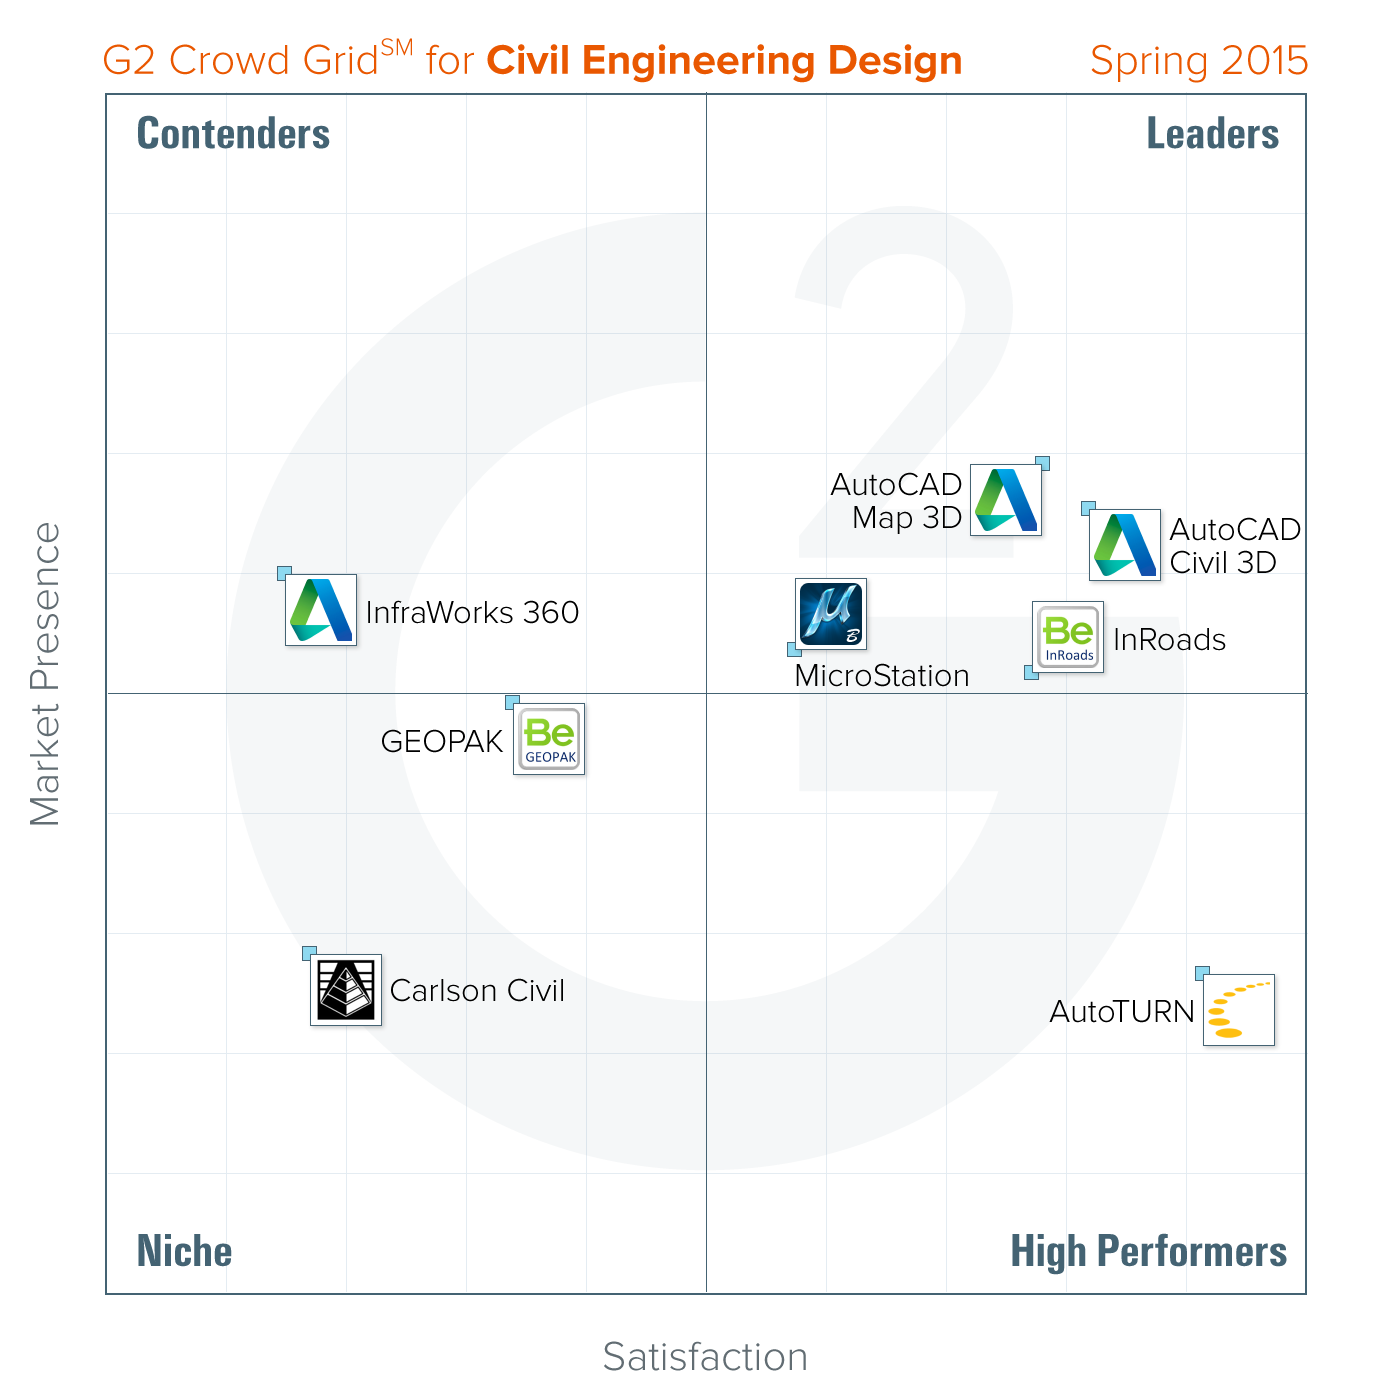 Best Civil Engineering Design Software: Spring 2015